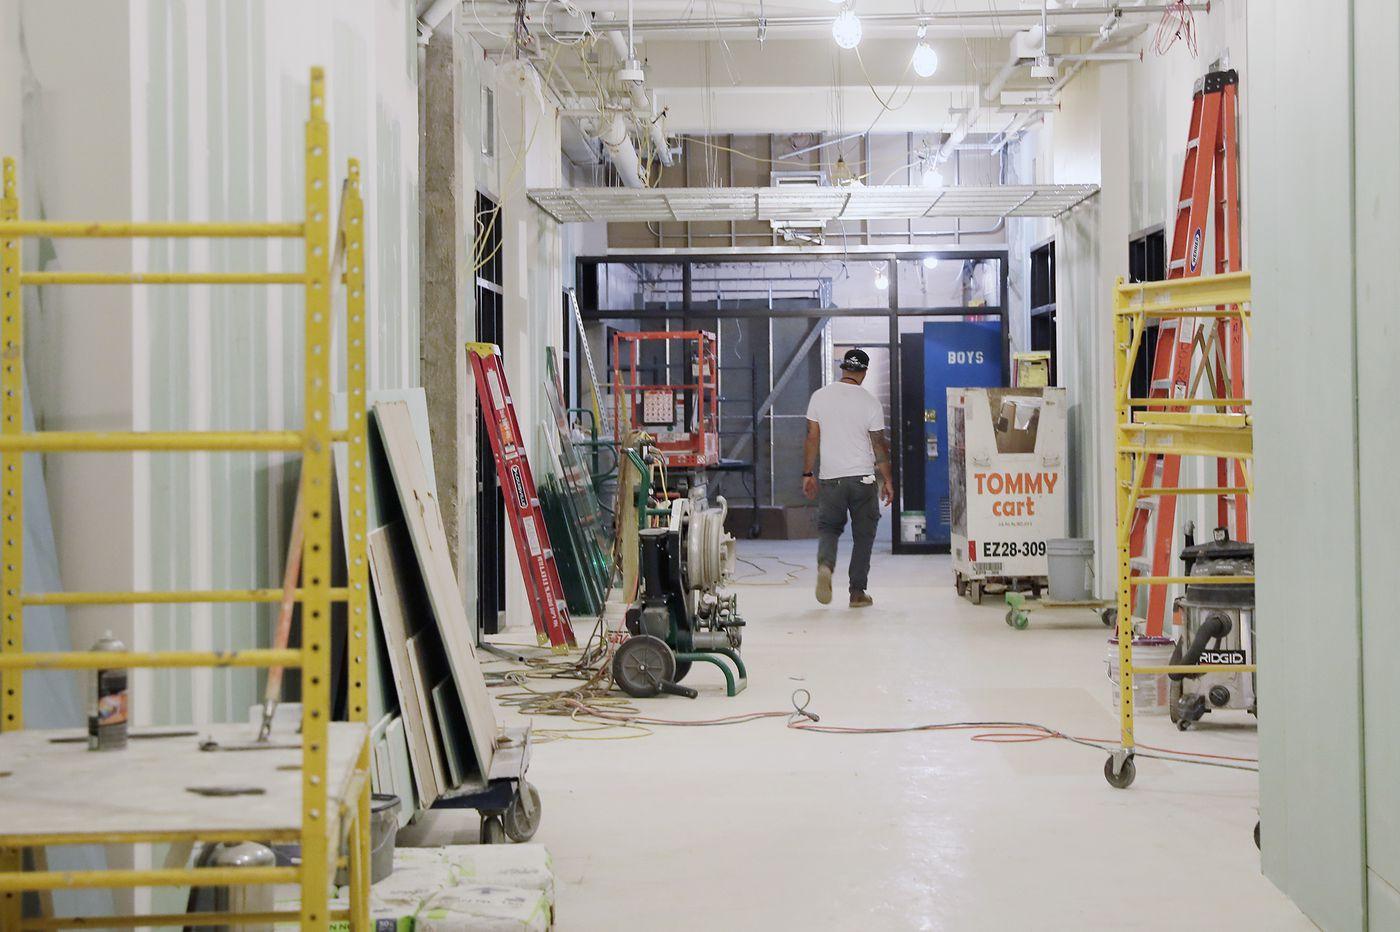 Missed asbestos, dangerous dust: How Philadelphia's Ben Franklin H.S. project went wrong